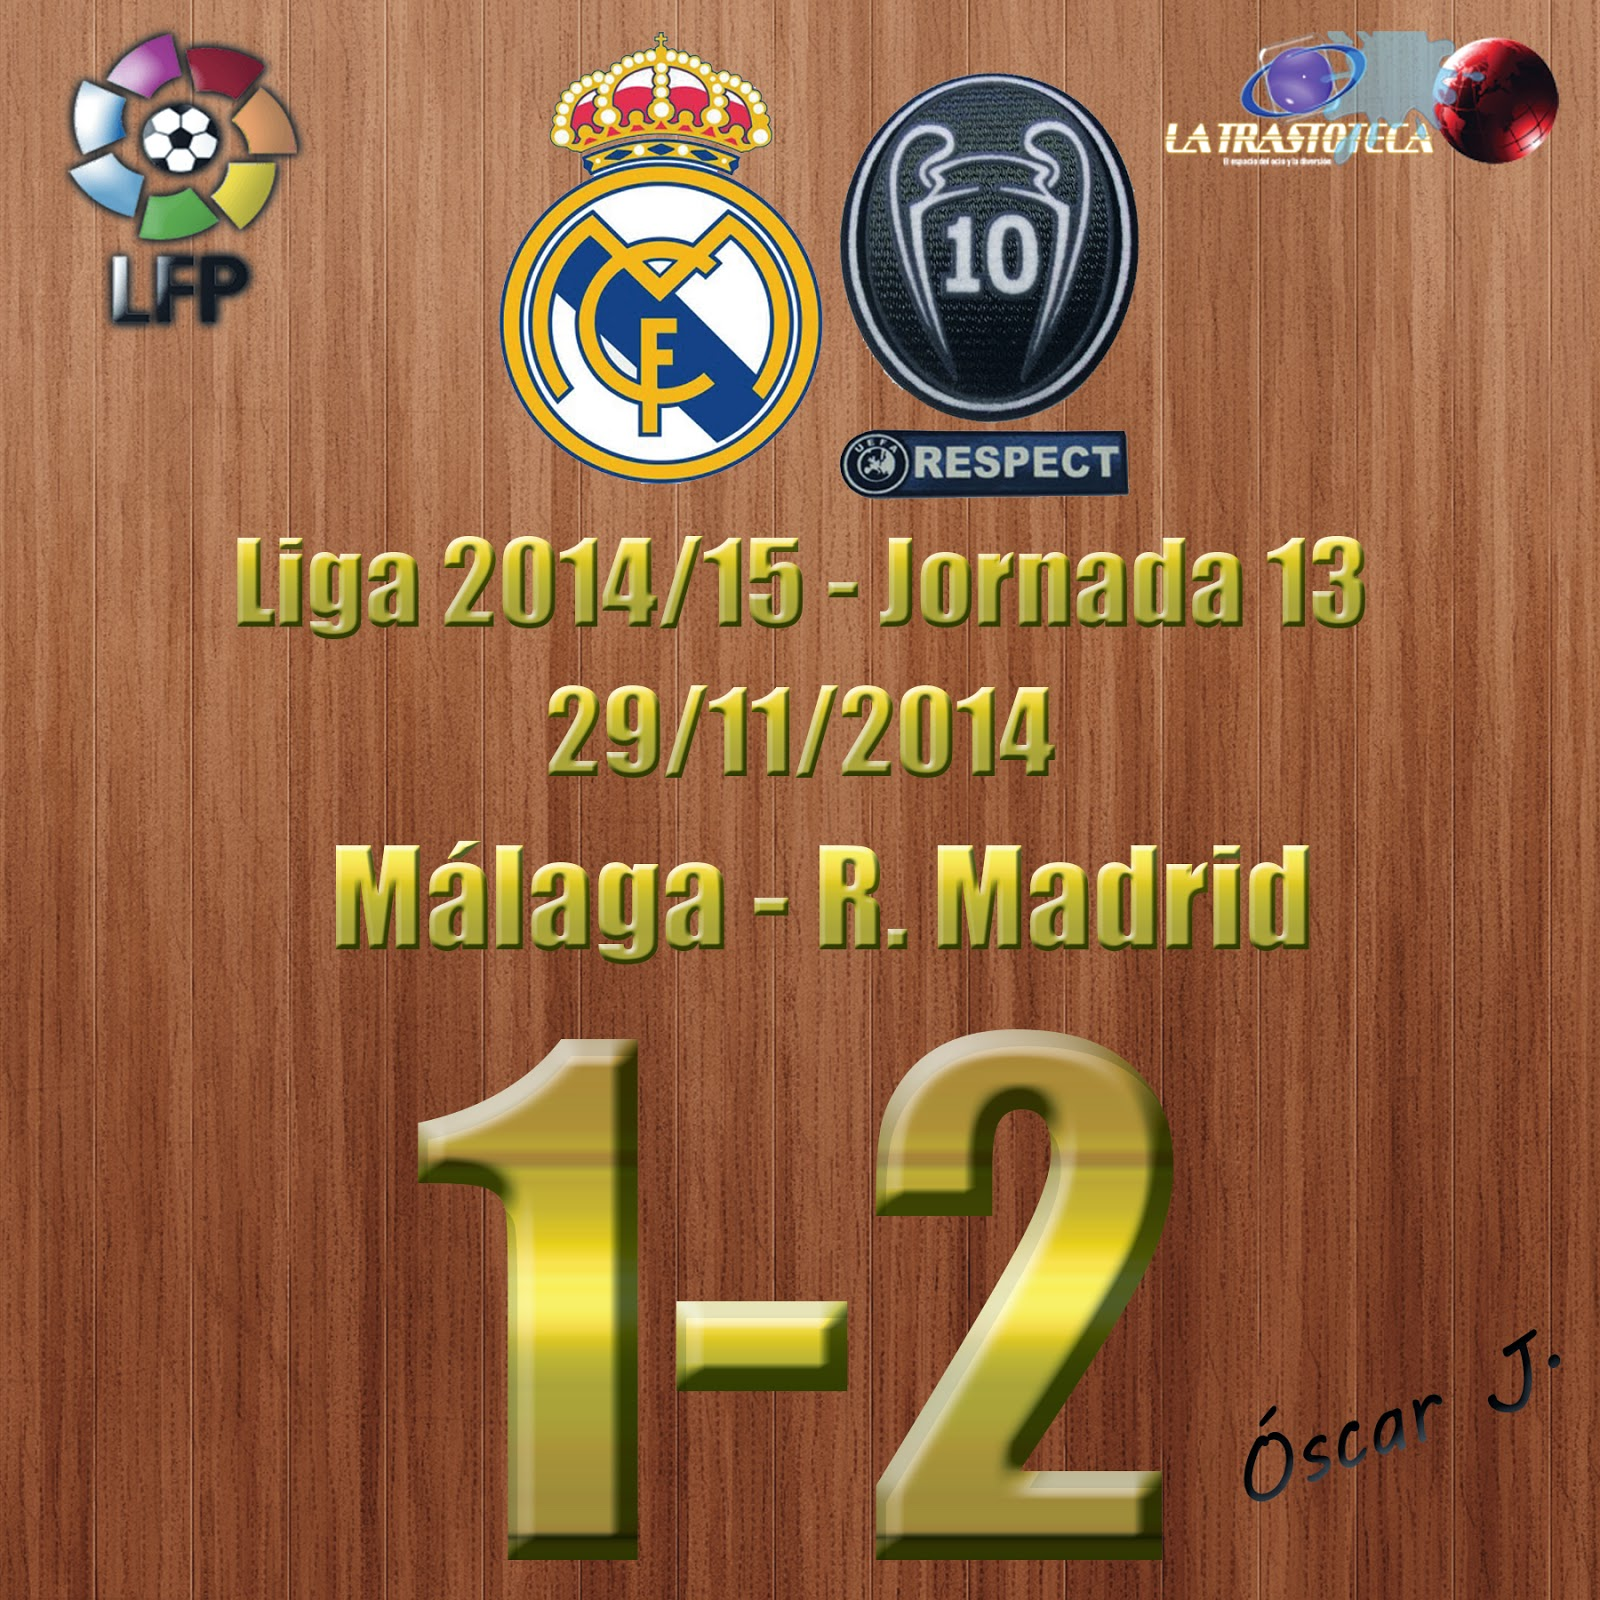 Benzema (0-1) - Málaga 1-2 Real Madrid - Liga 2014/15 - Jornada 13 - (29/11/2014)